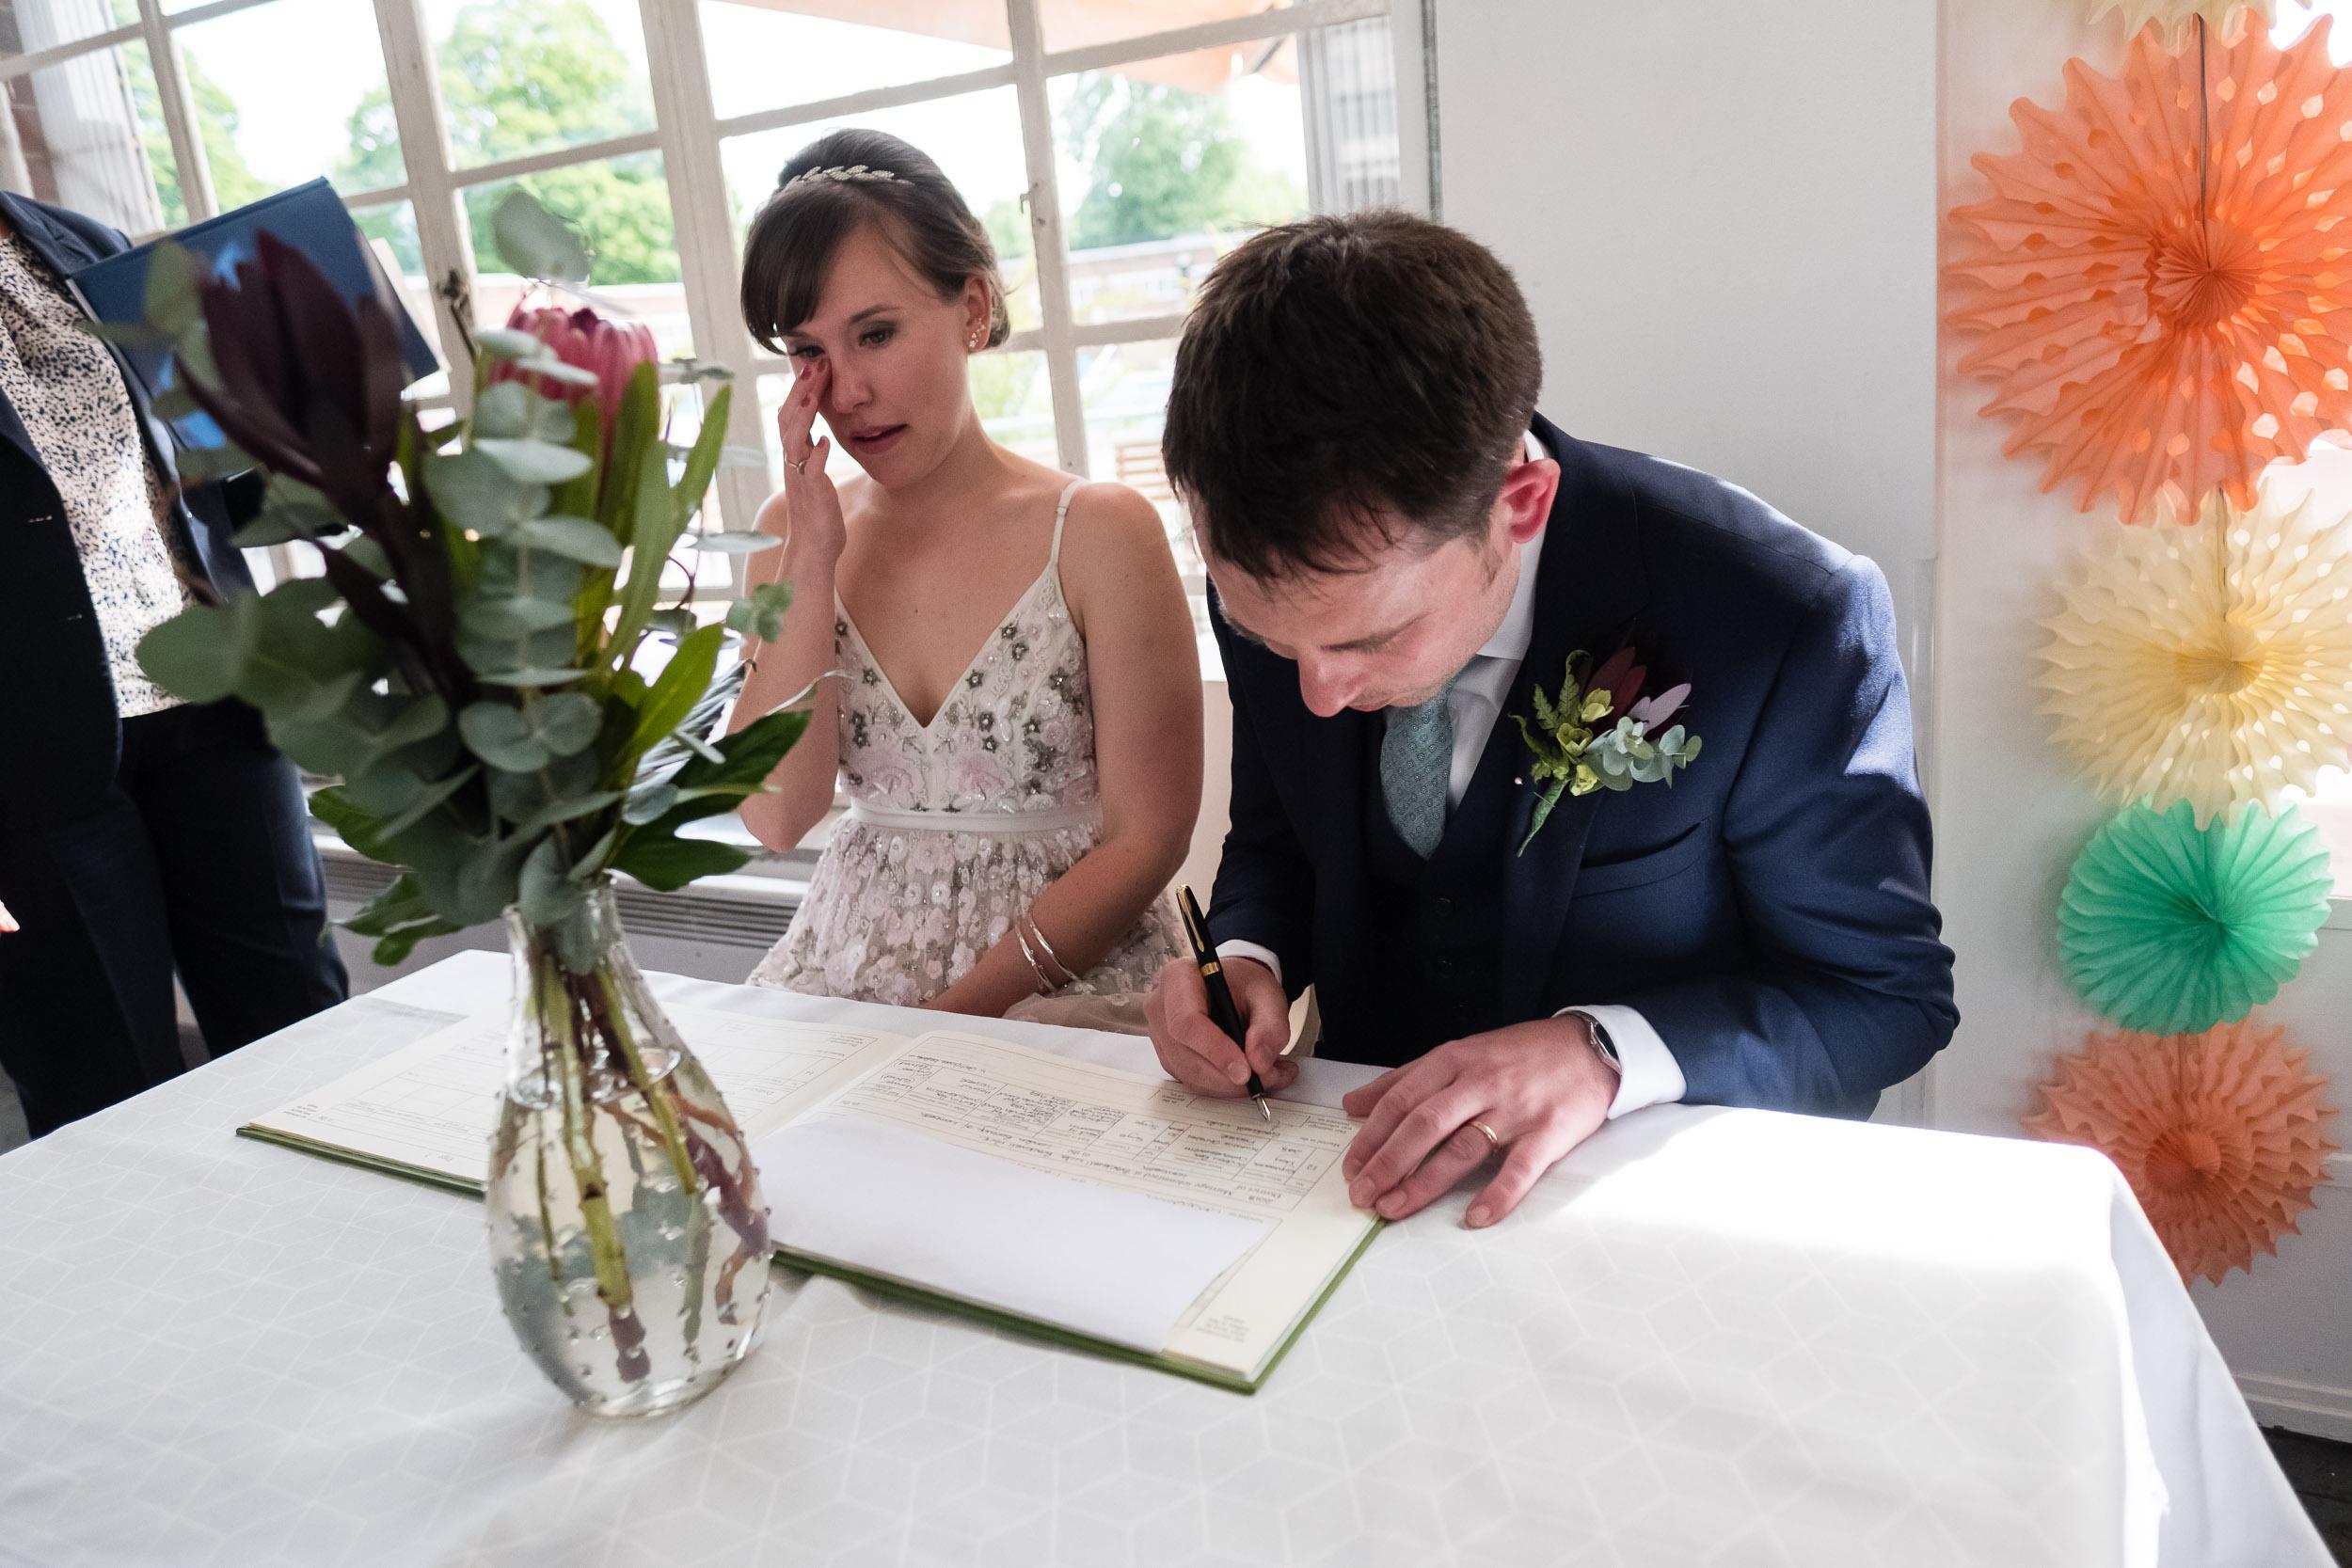 brockwell-lido-brixton-herne-hill-wedding-192.jpg